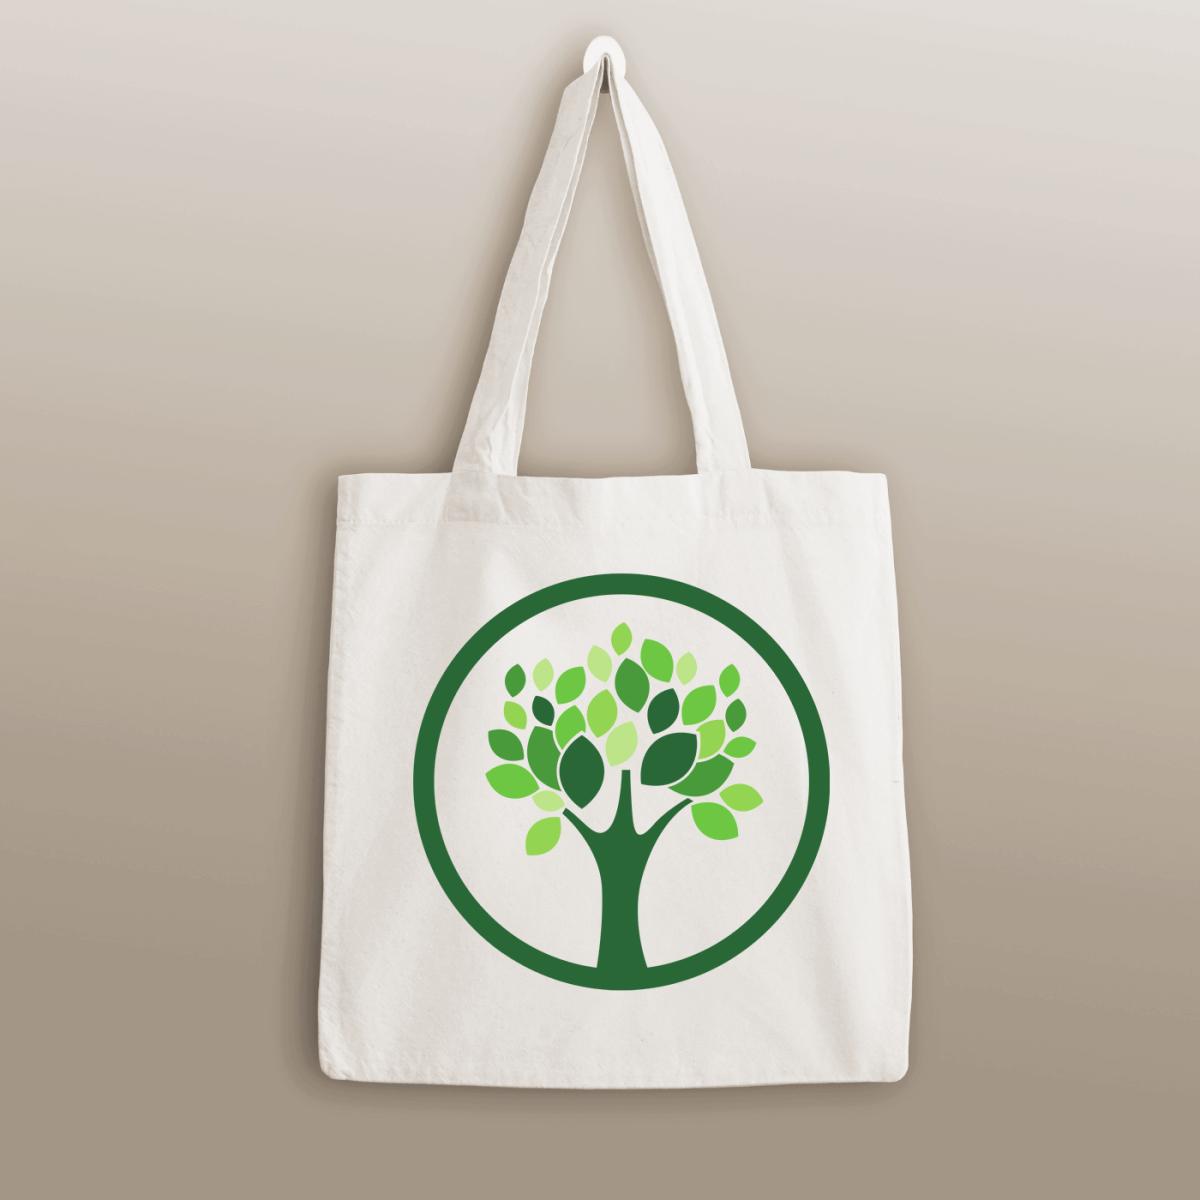 Tote Bags - Green Tree